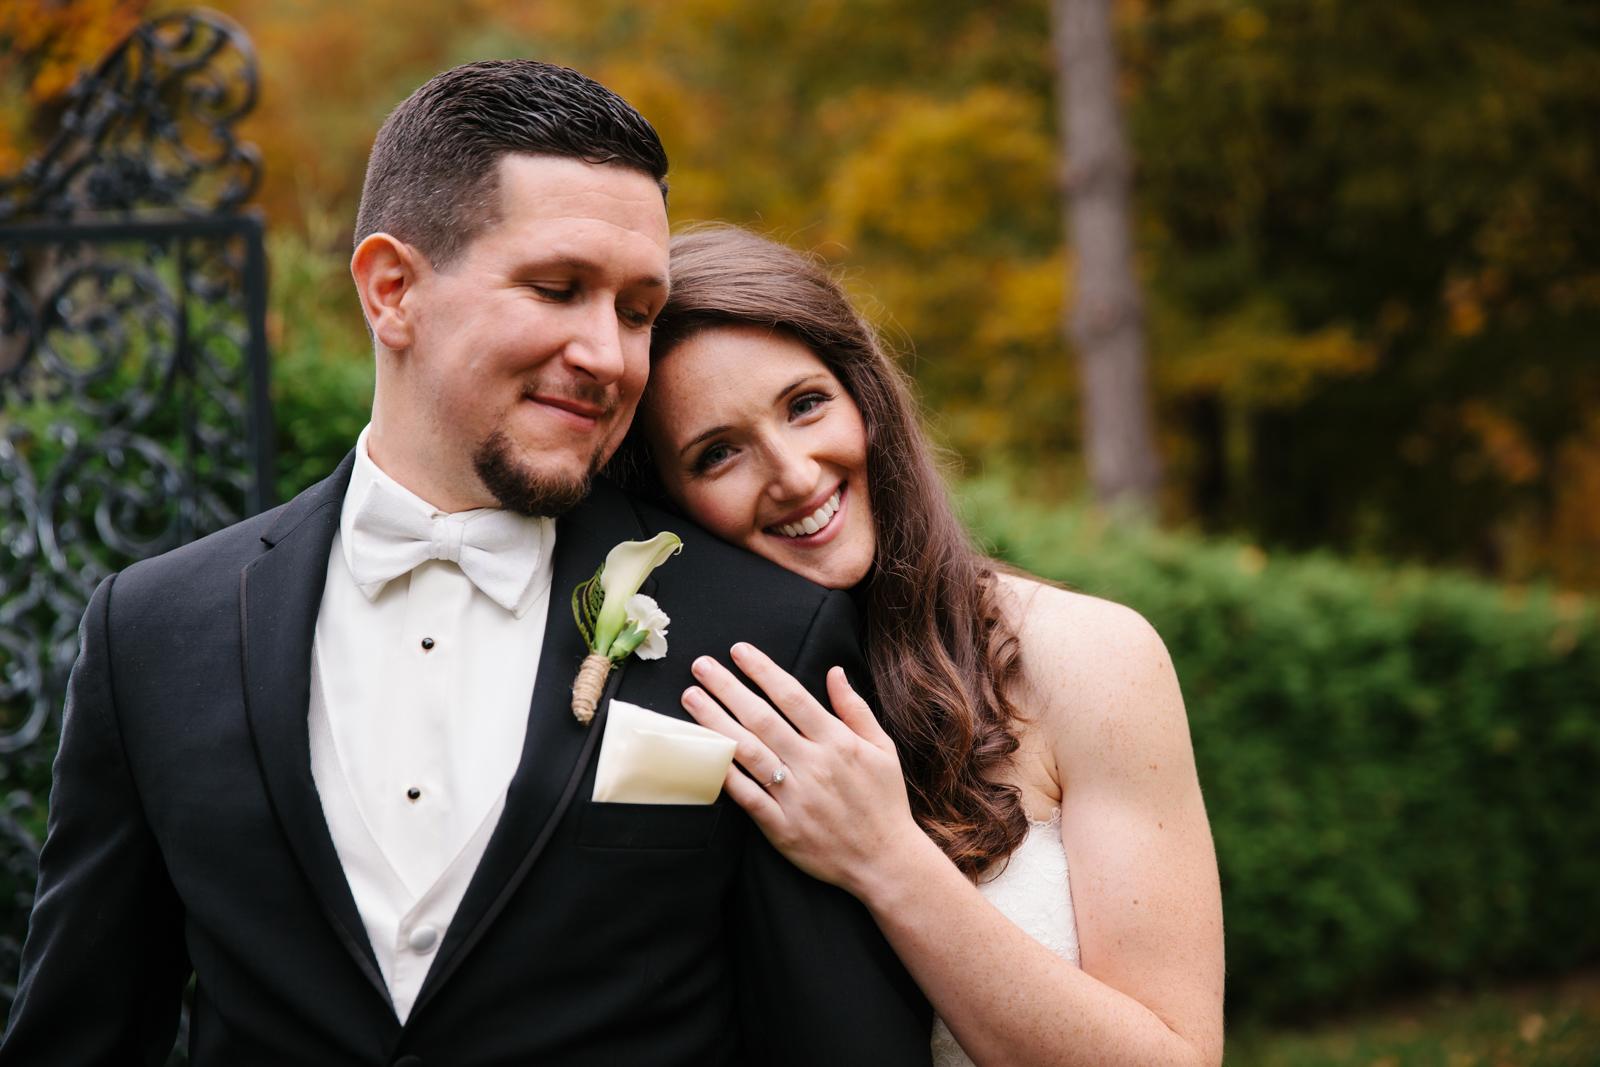 Glimmerstone-Mansion-Vermont-Wedding-Photography-Amanda-Morgan-84.jpg